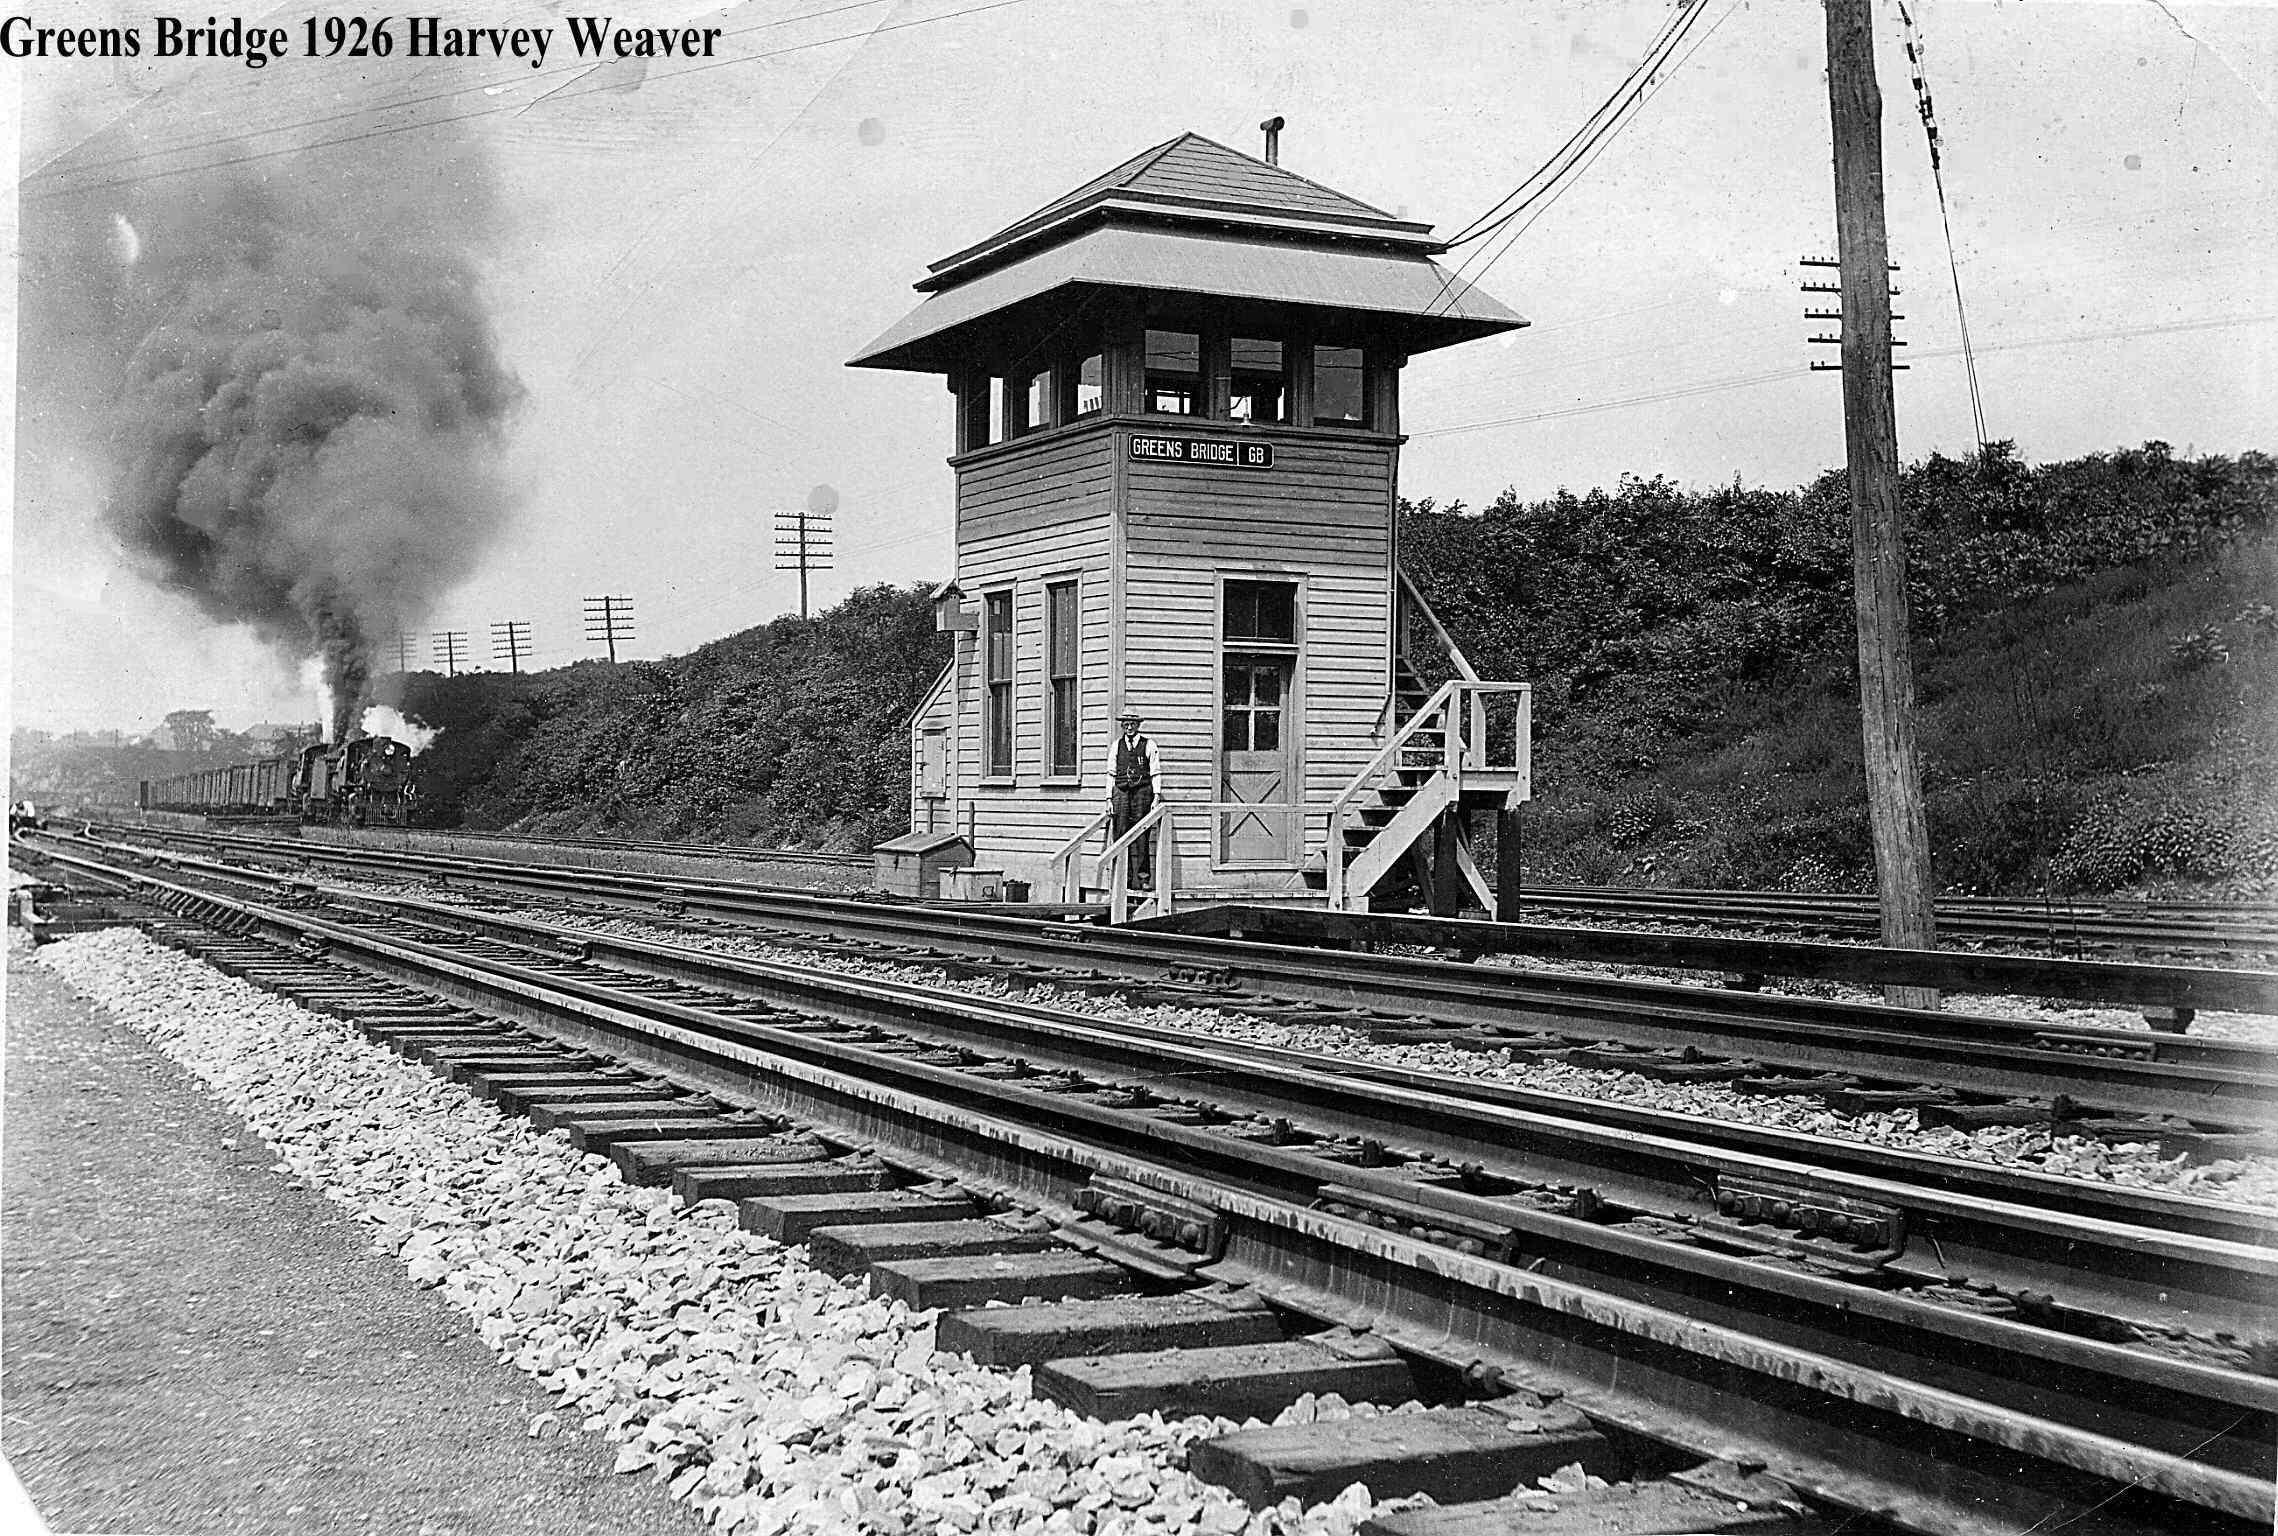 Green Bridge Tower. Phillipsburg, N.J. 1926